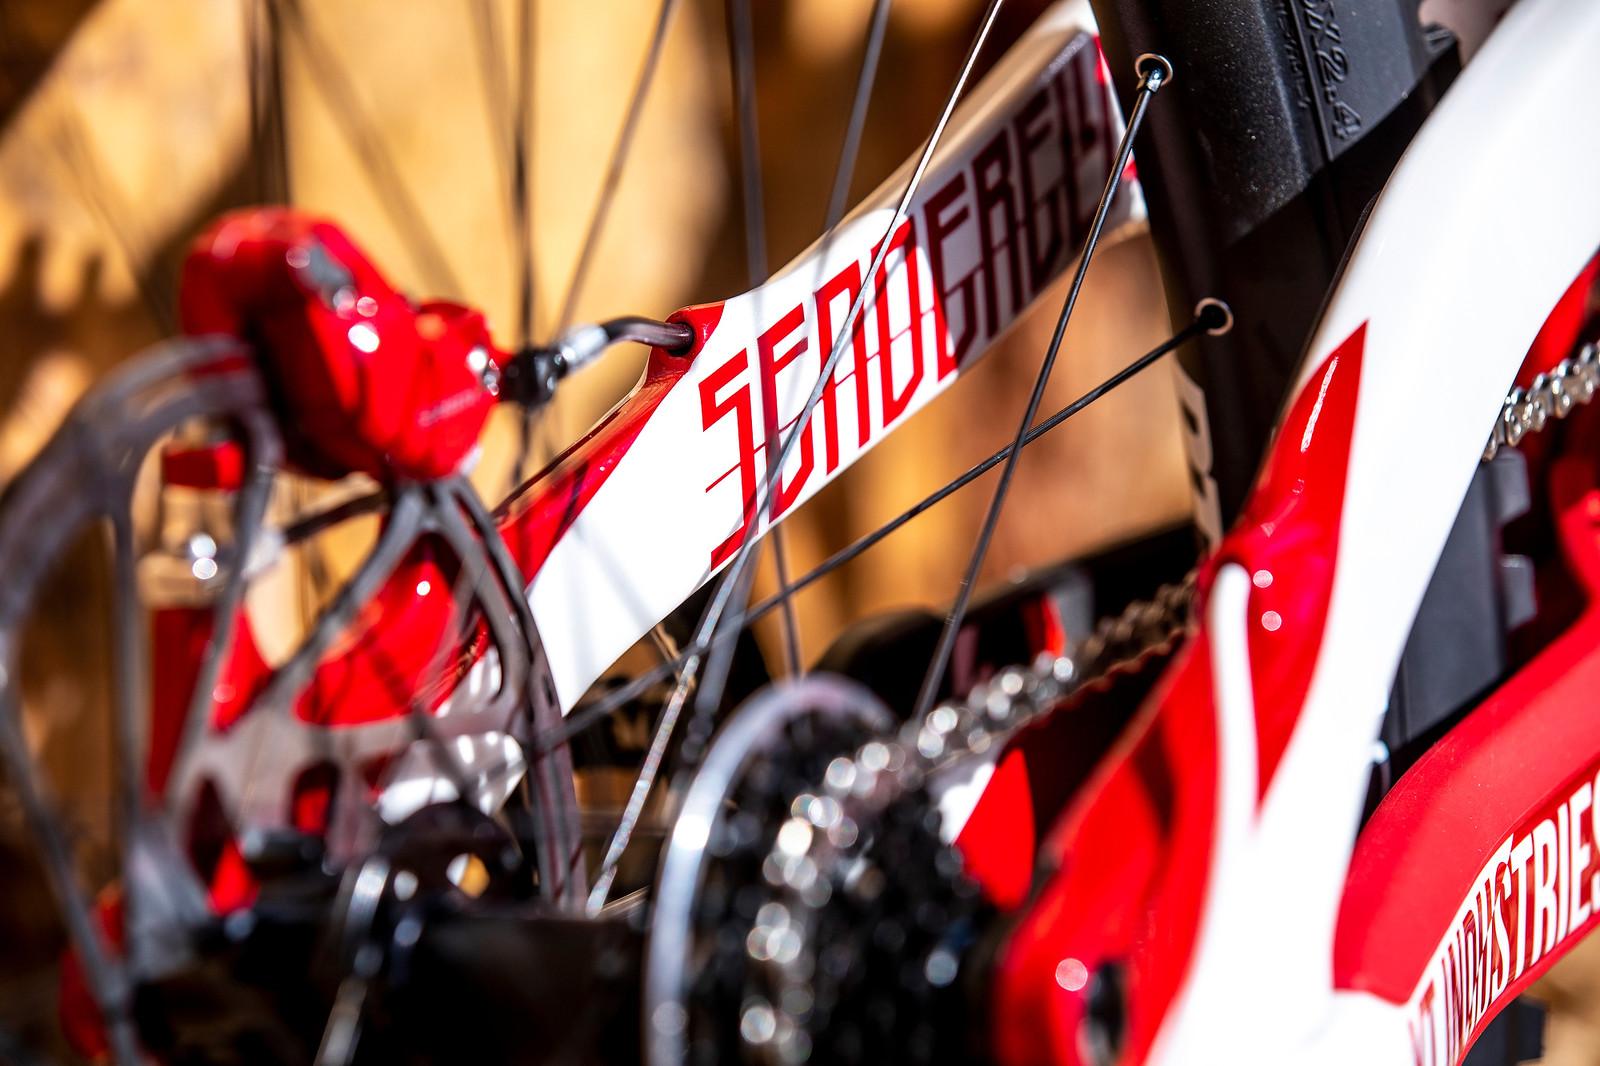 Senderella - WORLD CHAMPS BIKE - Vali Holl's YT TUES - Mountain Biking Pictures - Vital MTB